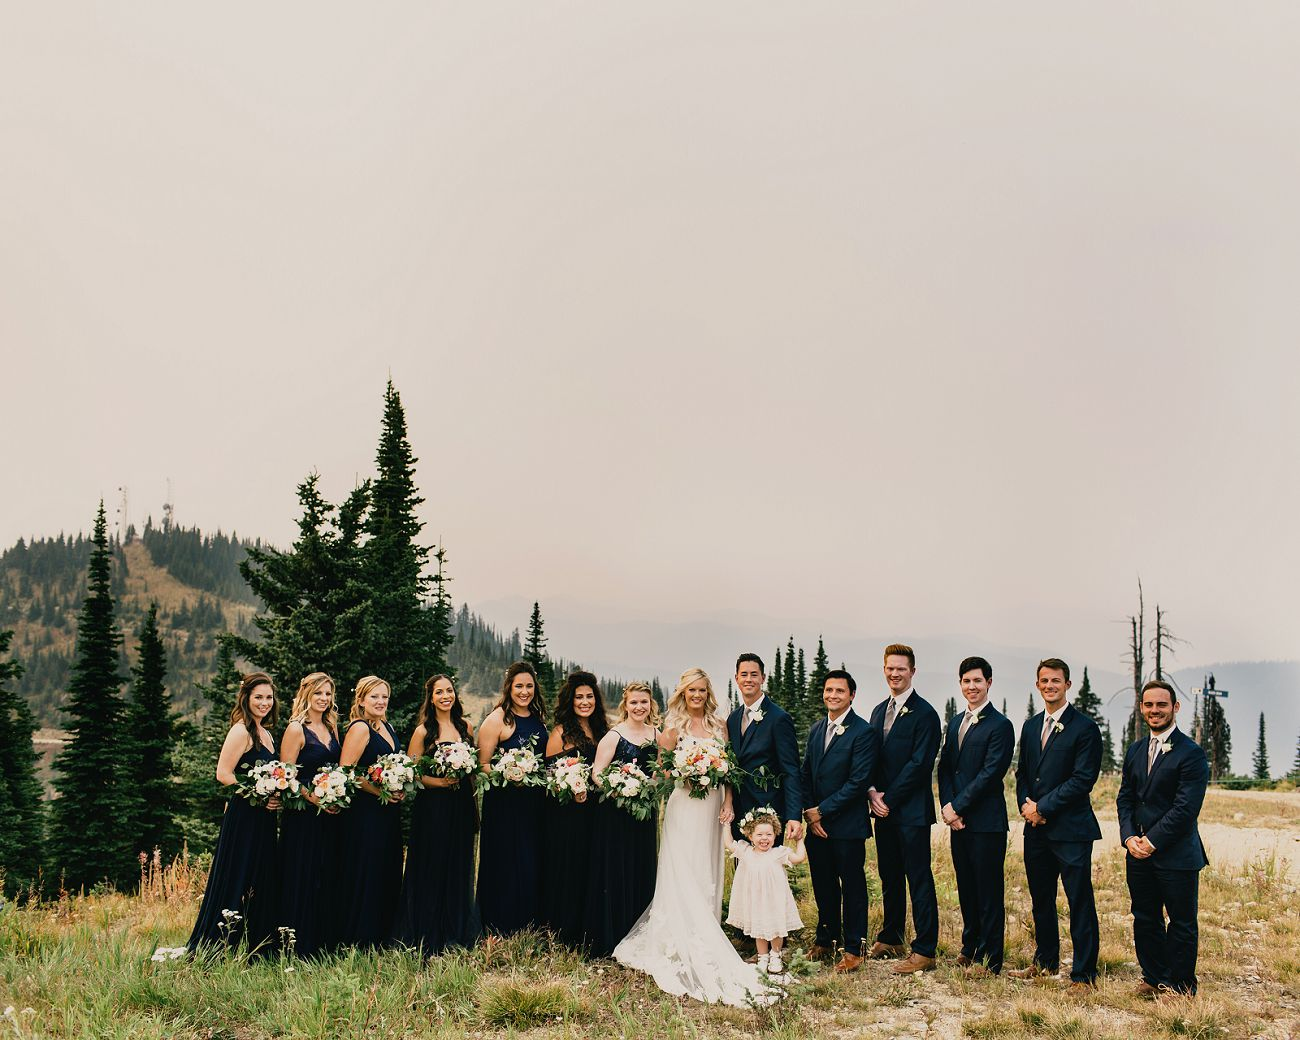 Jennifer_Mooney_Photo_Whitefish_mountain_resort_wedding_elegant_montana_wedding_009.jpg